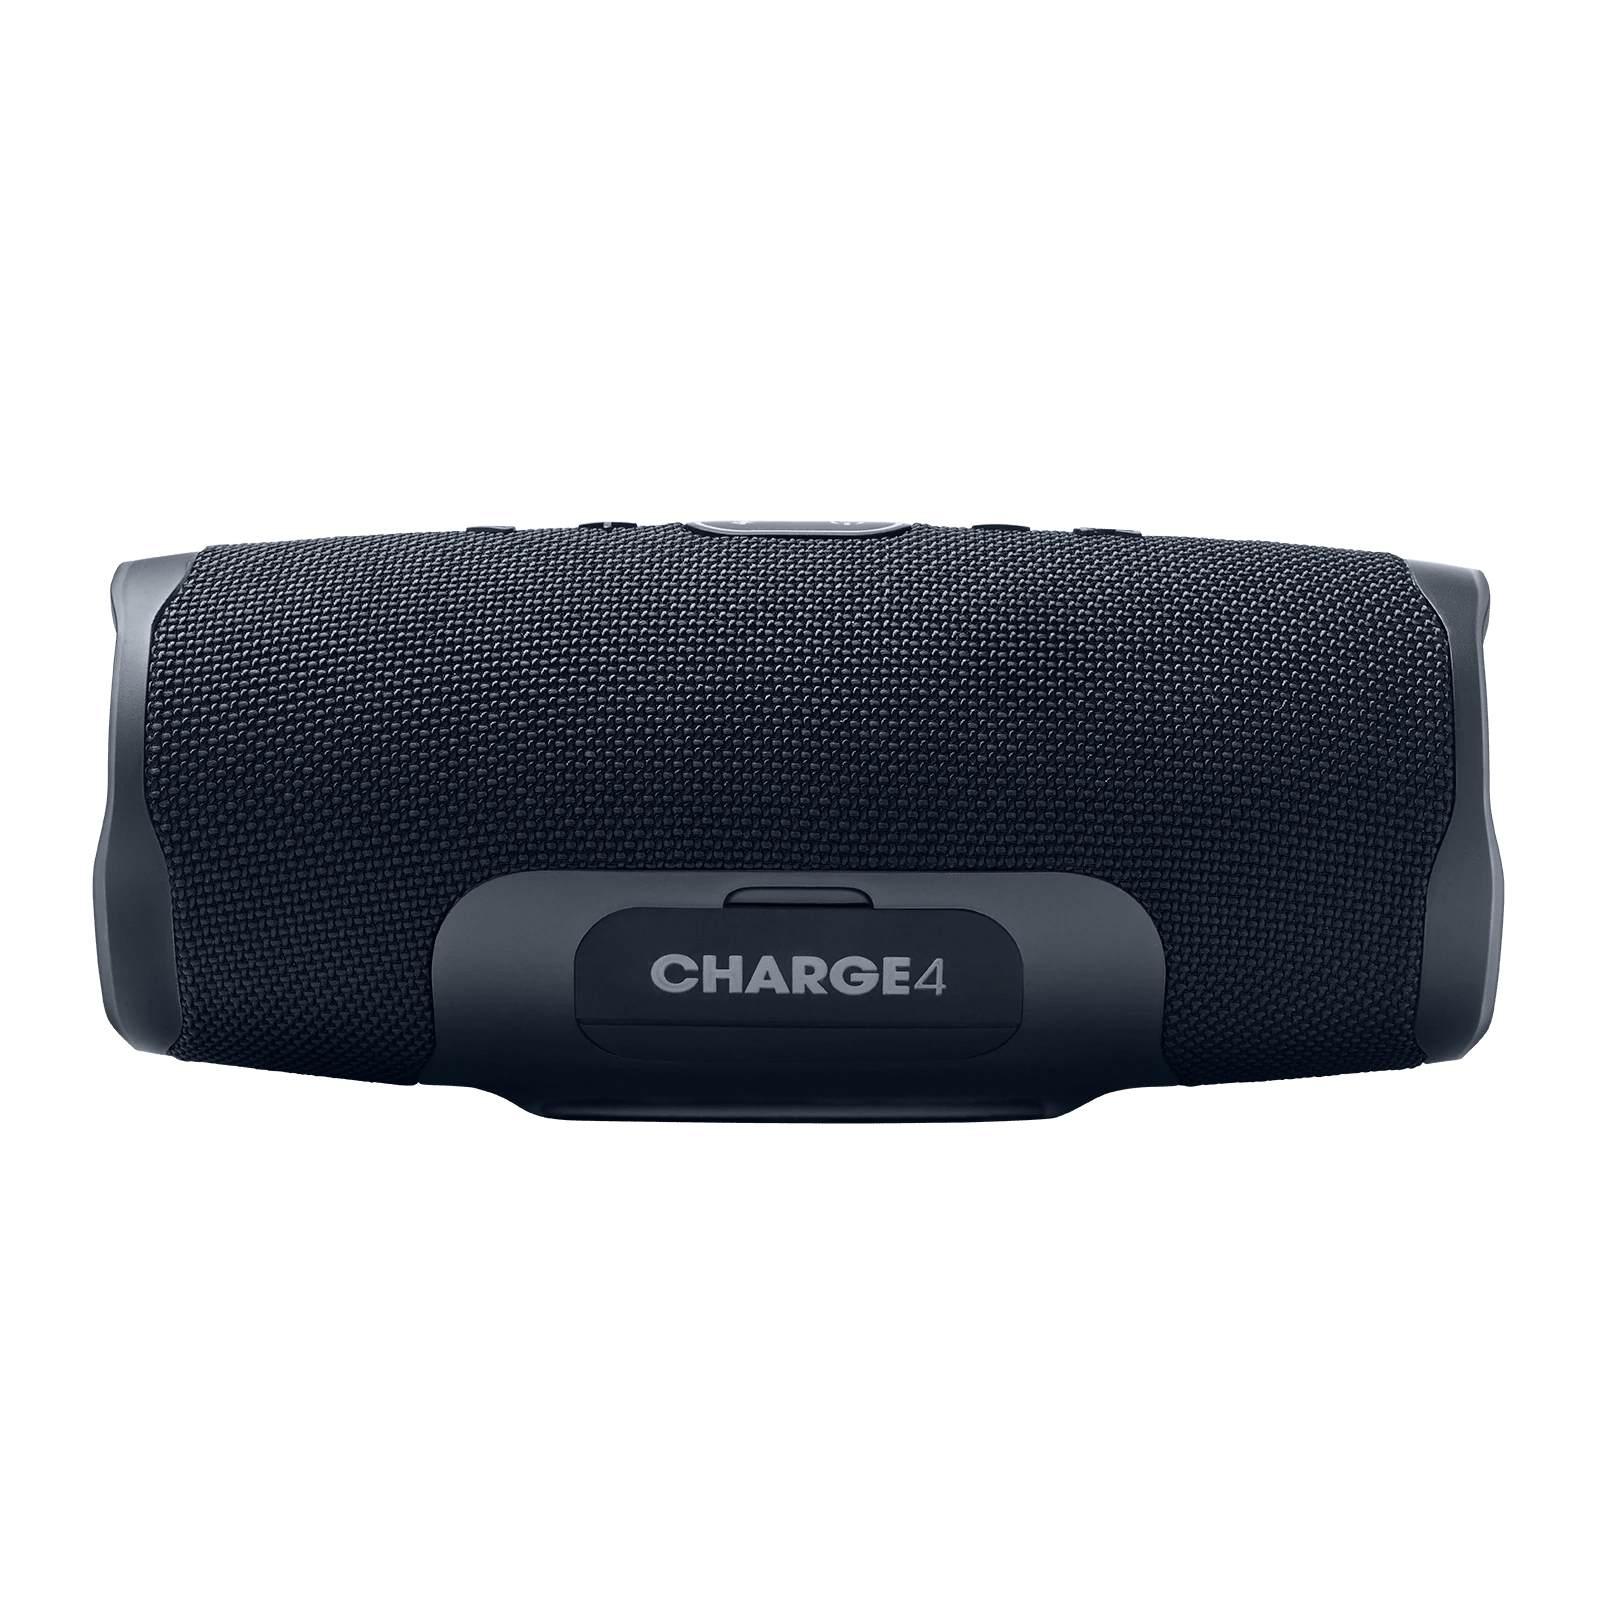 Caixa de Som Bluetooth Portátil JBL Charge 4 - Preto JBLCHARGE4BLK